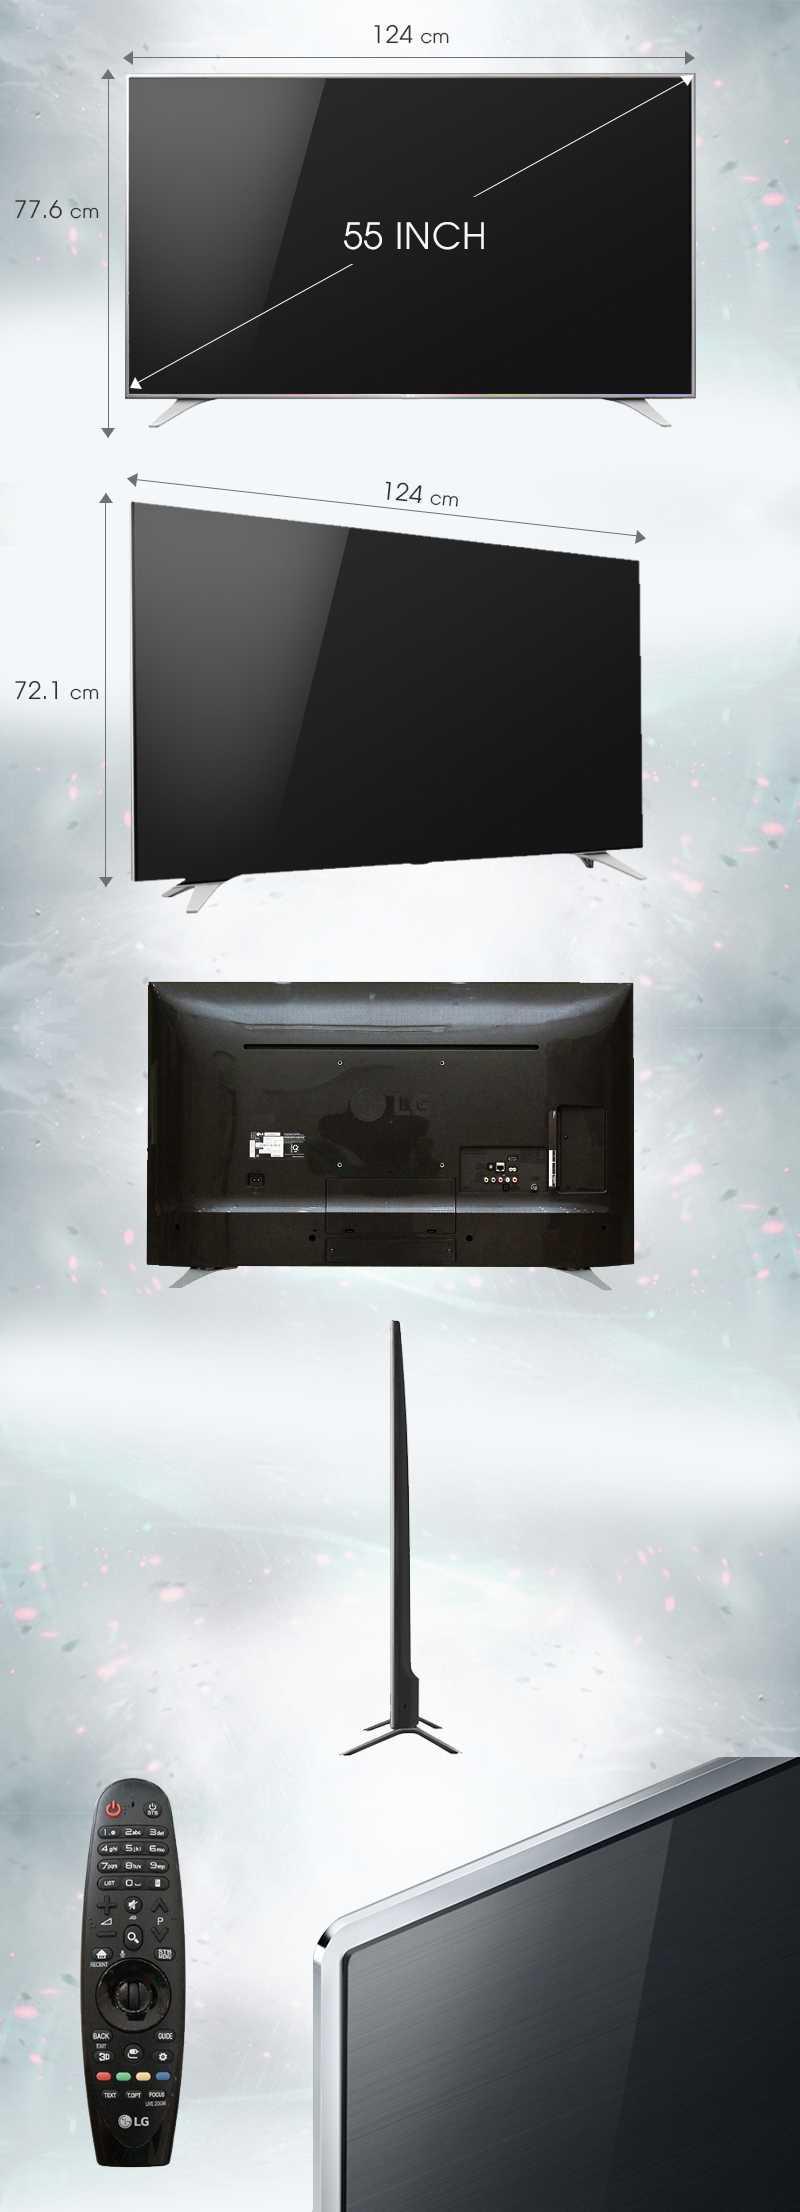 Smart Tivi LG 55 inch 55UH650T-Tivi